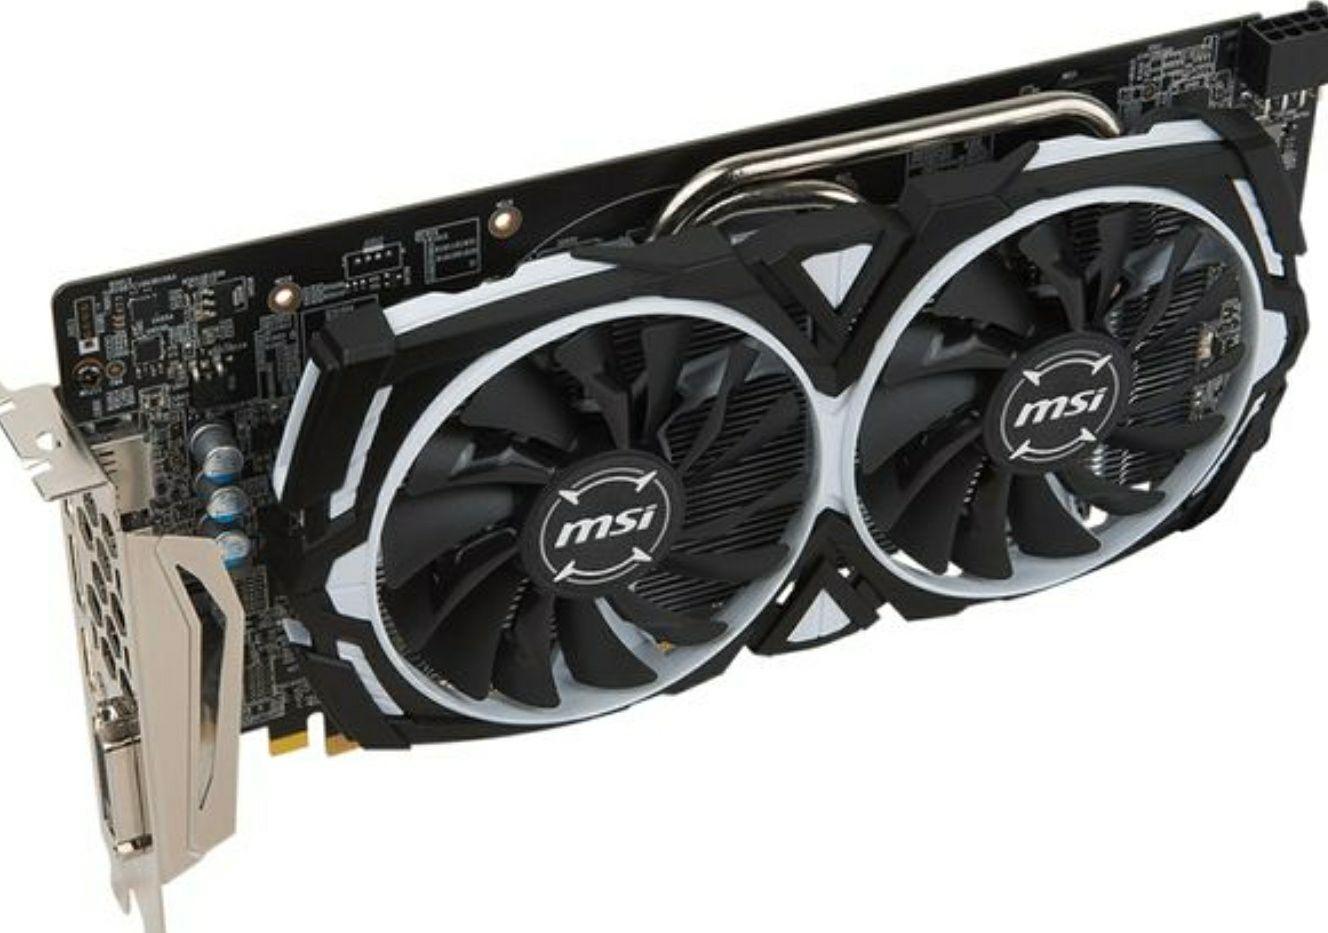 MSIRadeon RX 580 8GB Armor OC Graphics CARD GPU £195 @ Currys